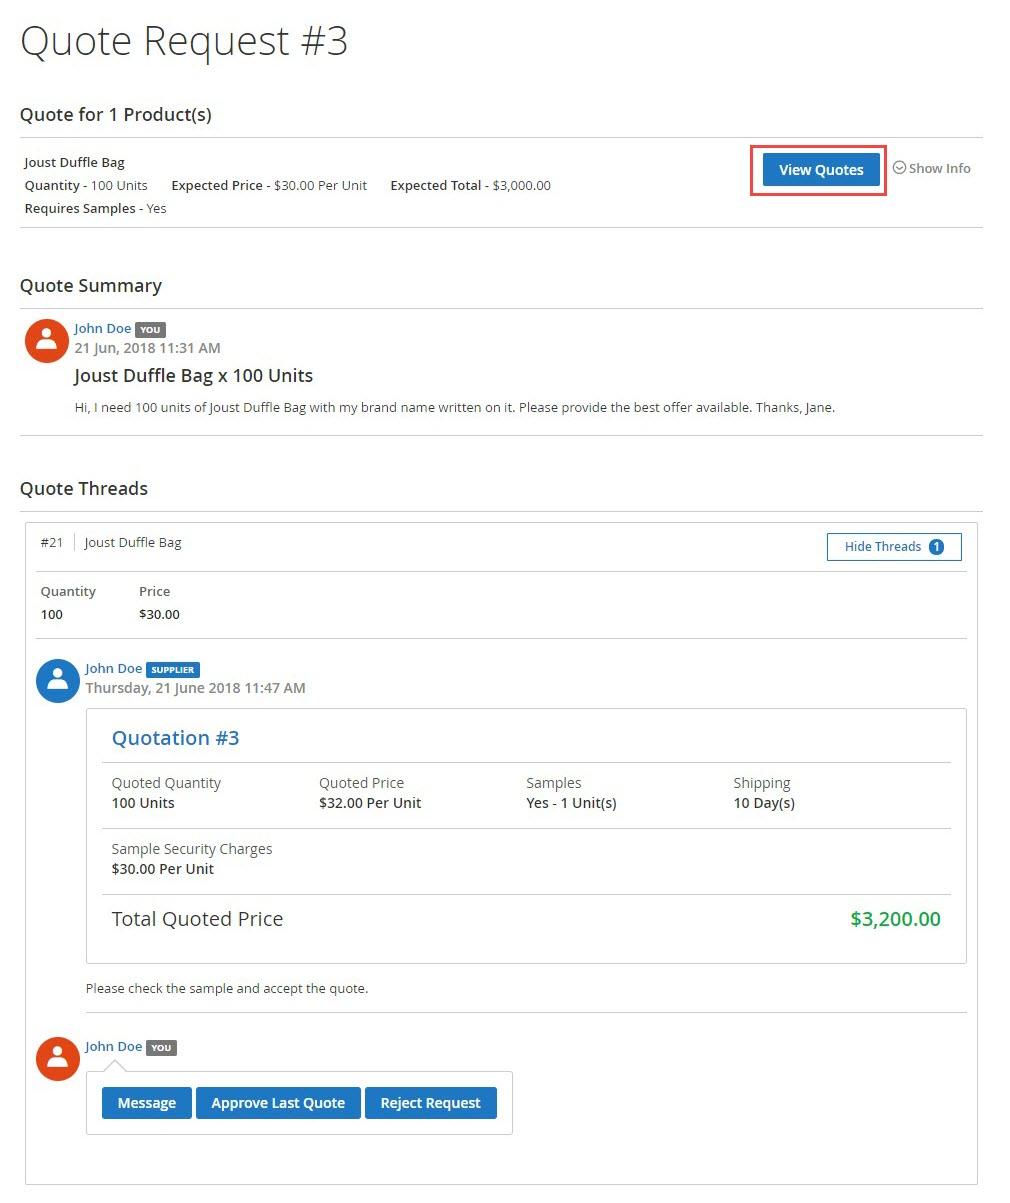 webkul-magento2-b2b-marketplace-request-quote-view-customer